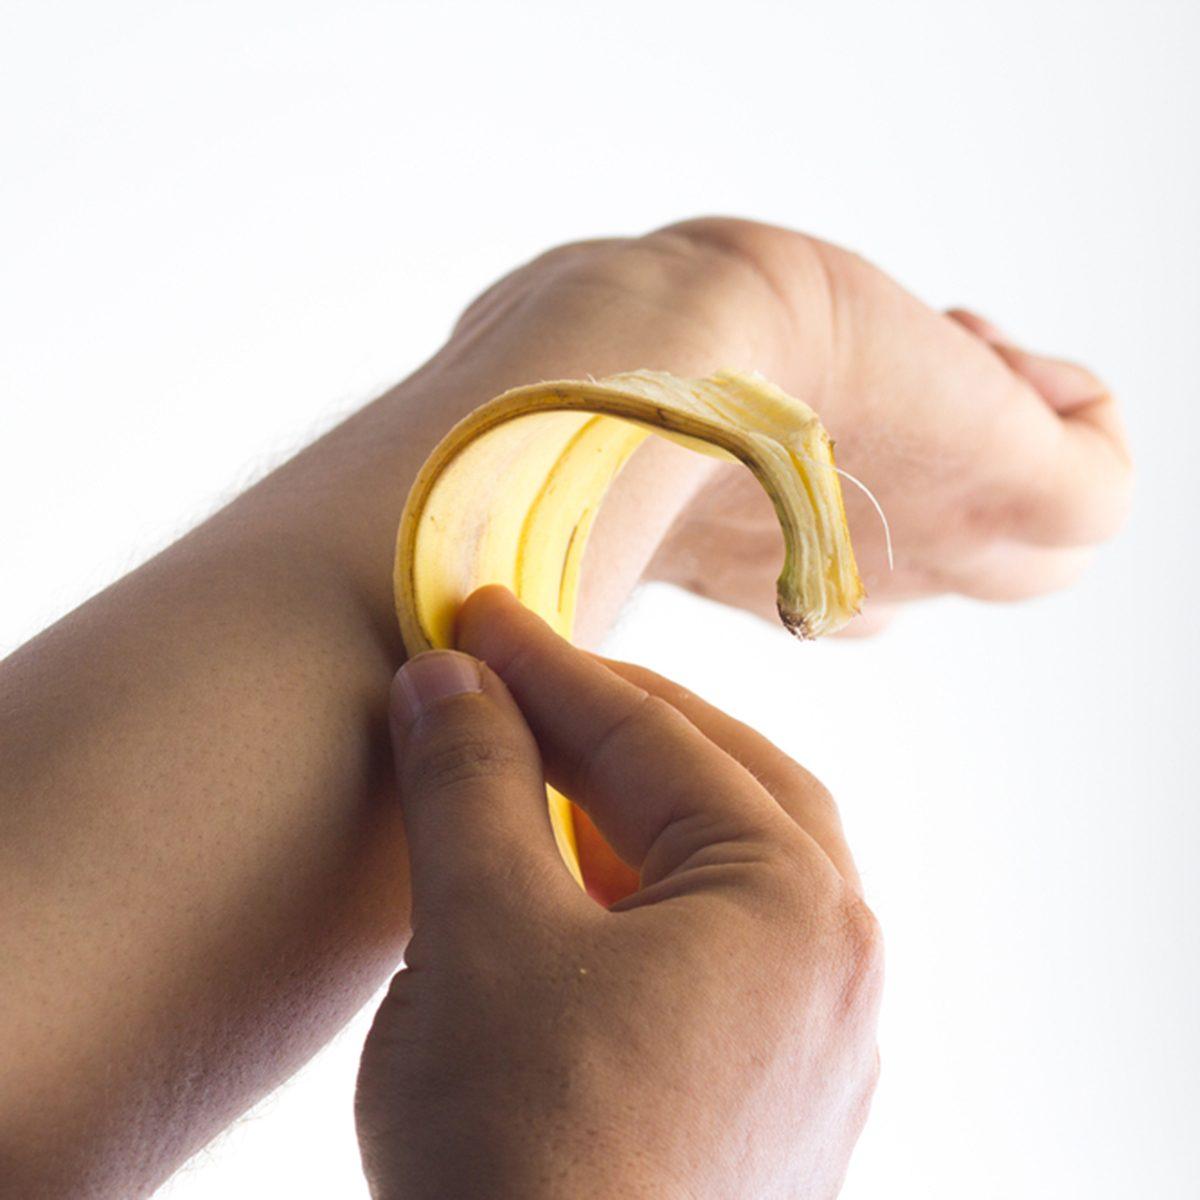 Using a banana peel on the skin